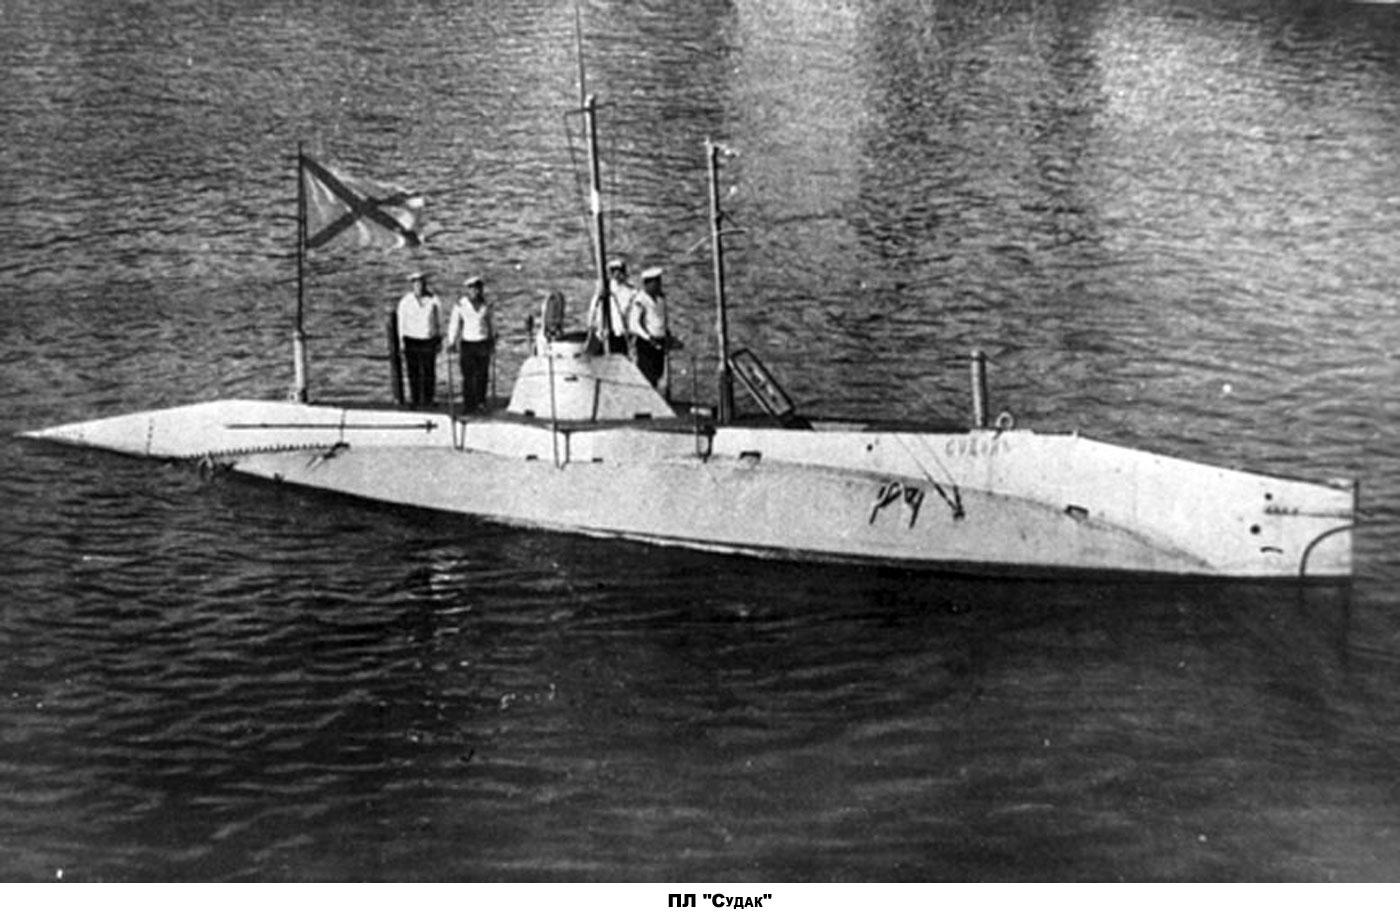 истинно русская лодка